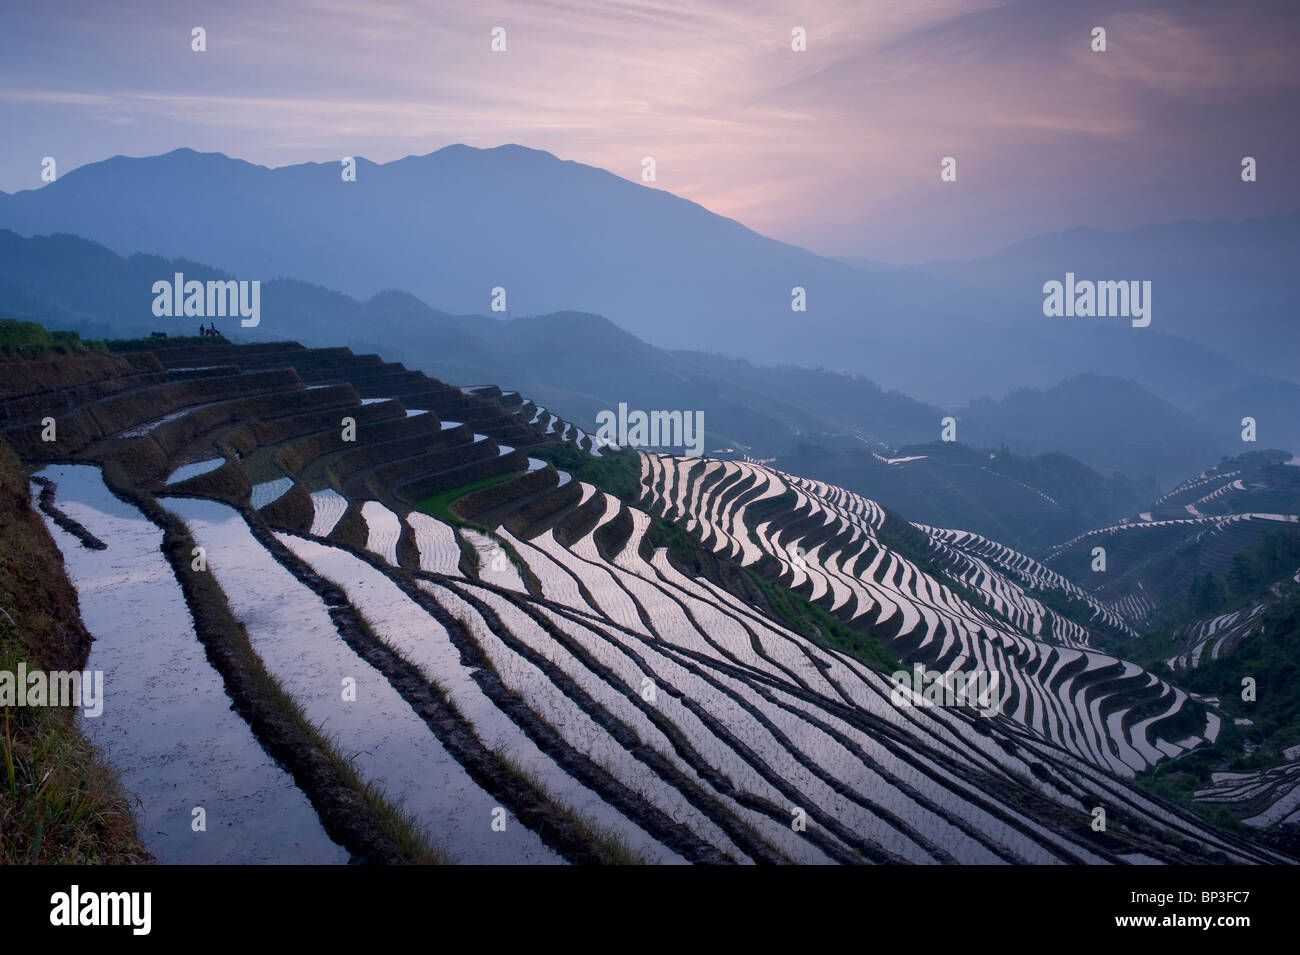 Sonnenuntergang am Drachen Rückgrat Reis-Terrassen in der Nähe von Yao Dorf Dazhai, Provinz Guangxi, China Stockbild